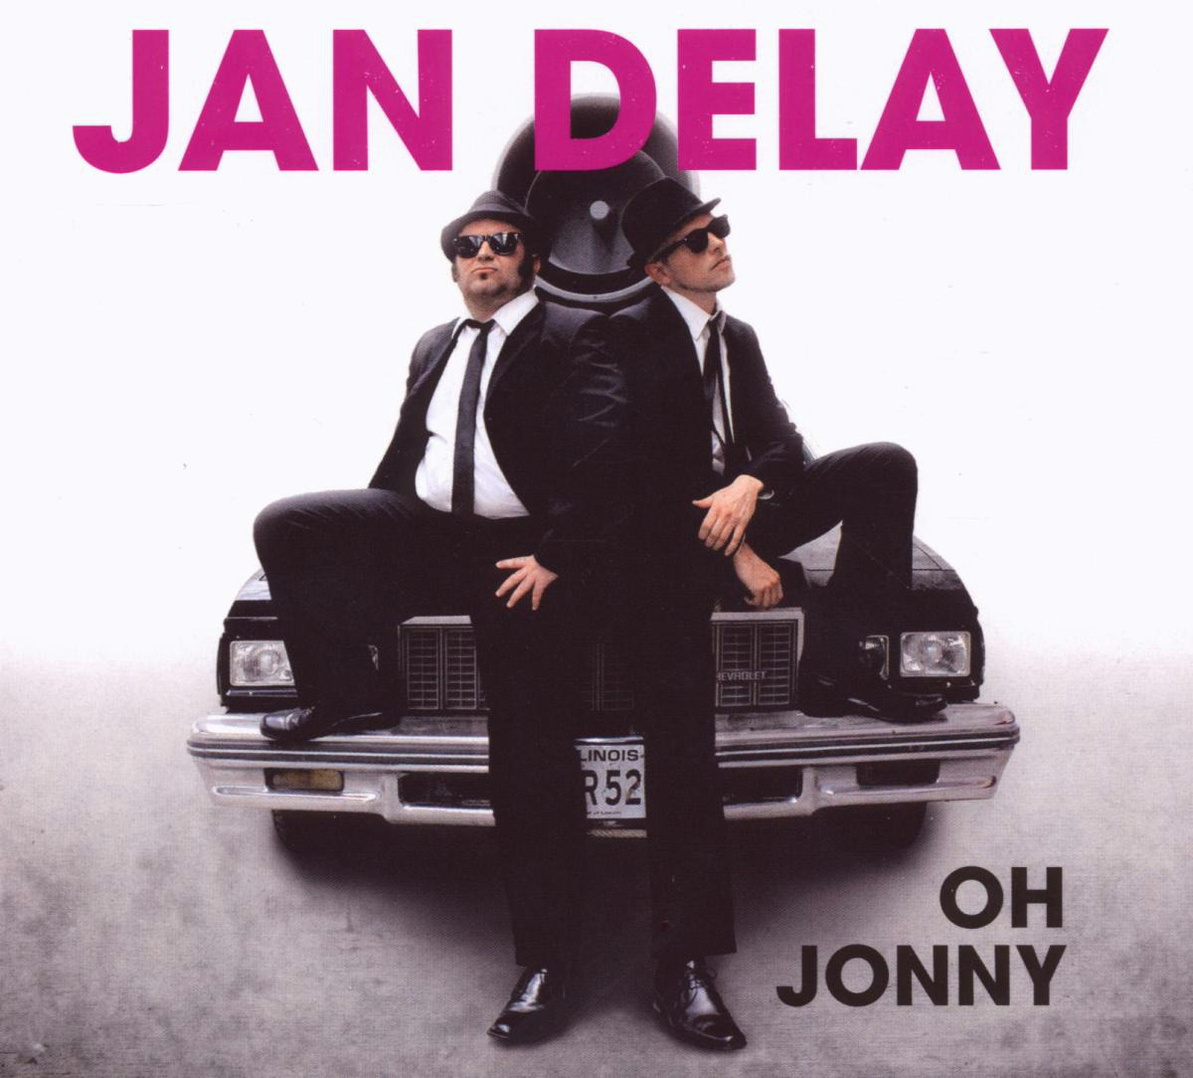 Jan Delay - Oh Jonny (Premium inkl. Jan Delay Aufnäher)